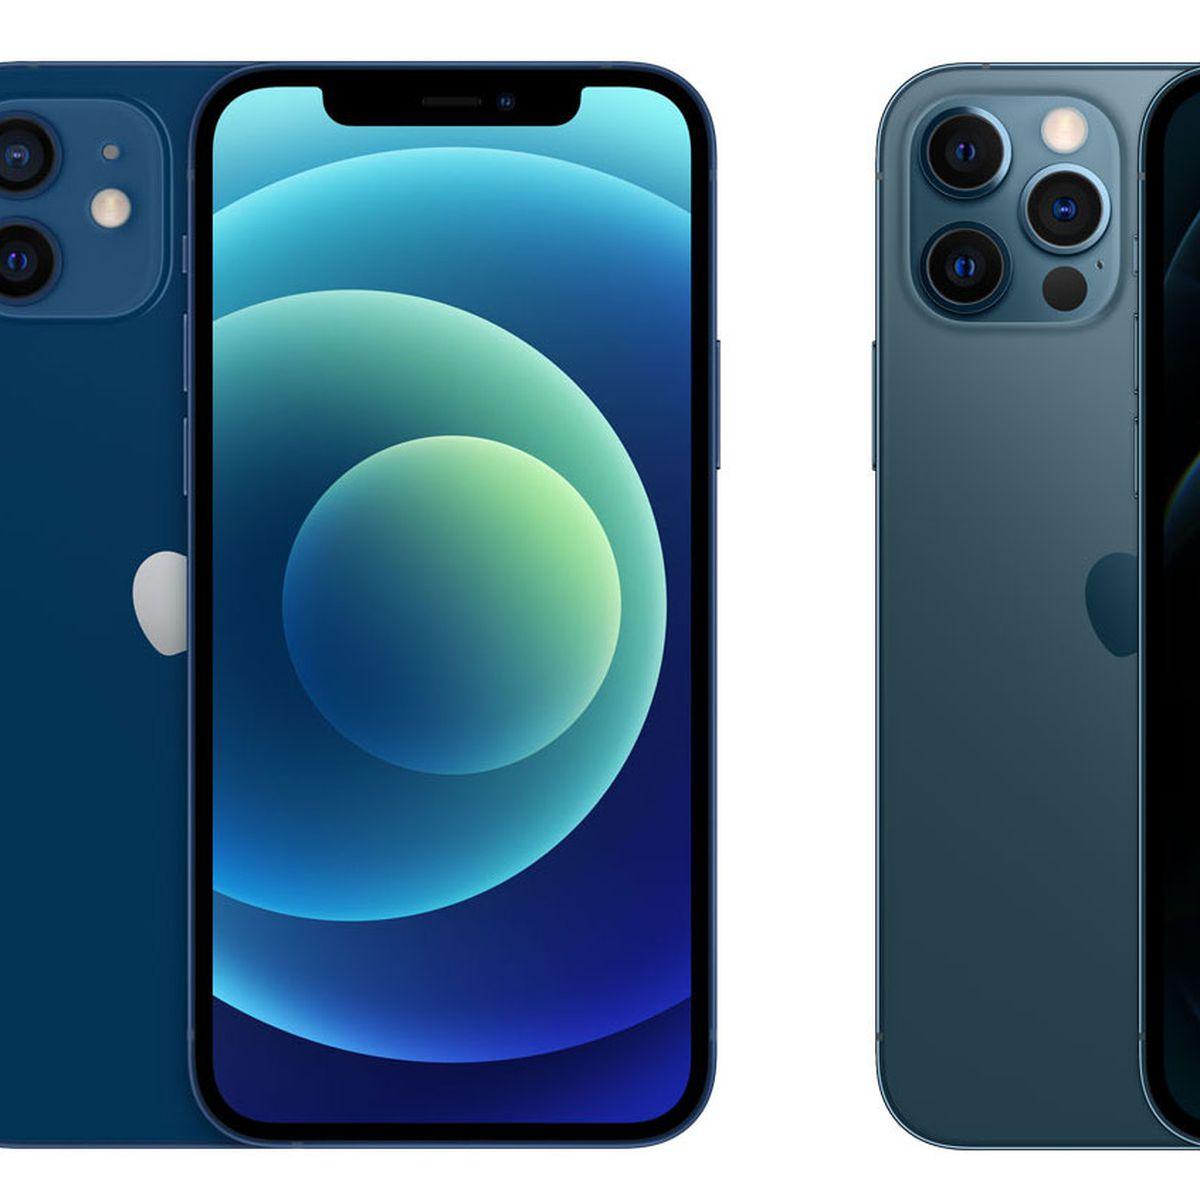 Iphone 12 Vs Iphone 12 Pro Buyer S Guide Macrumors